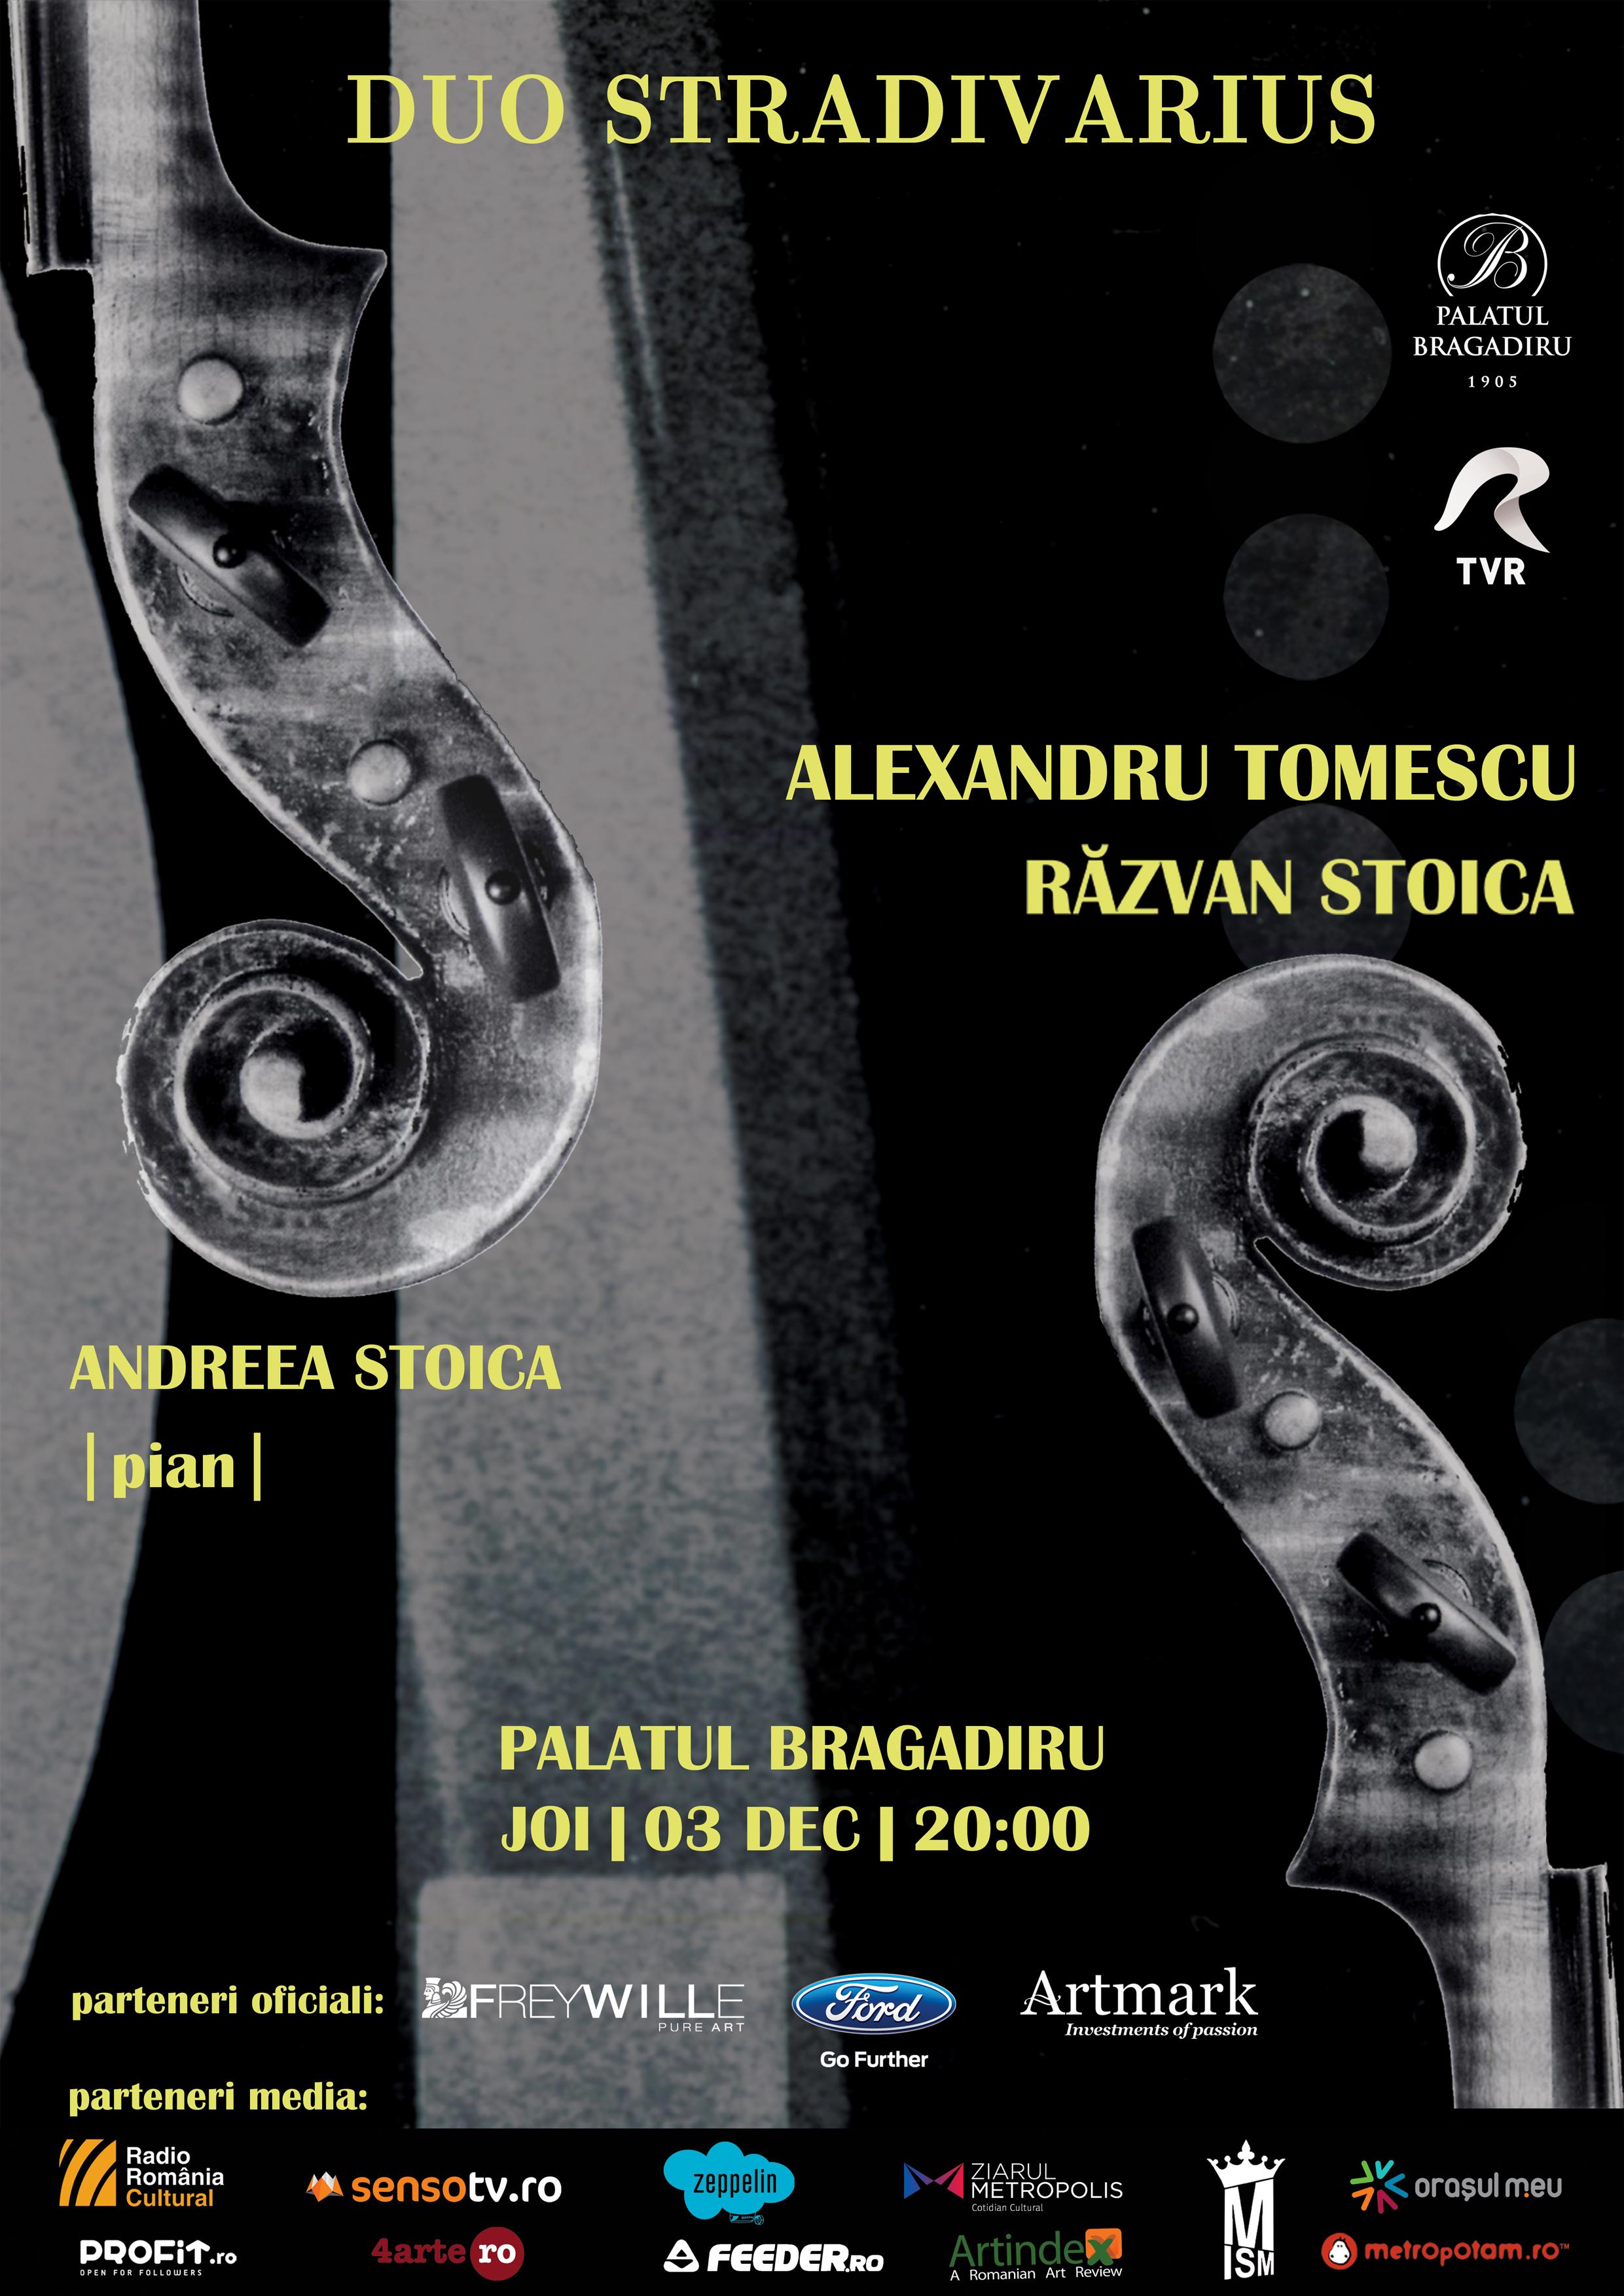 DUO STRADIVARIUS, un concert extraordinar cu Alexandru Tomescu si Razvan Stoica